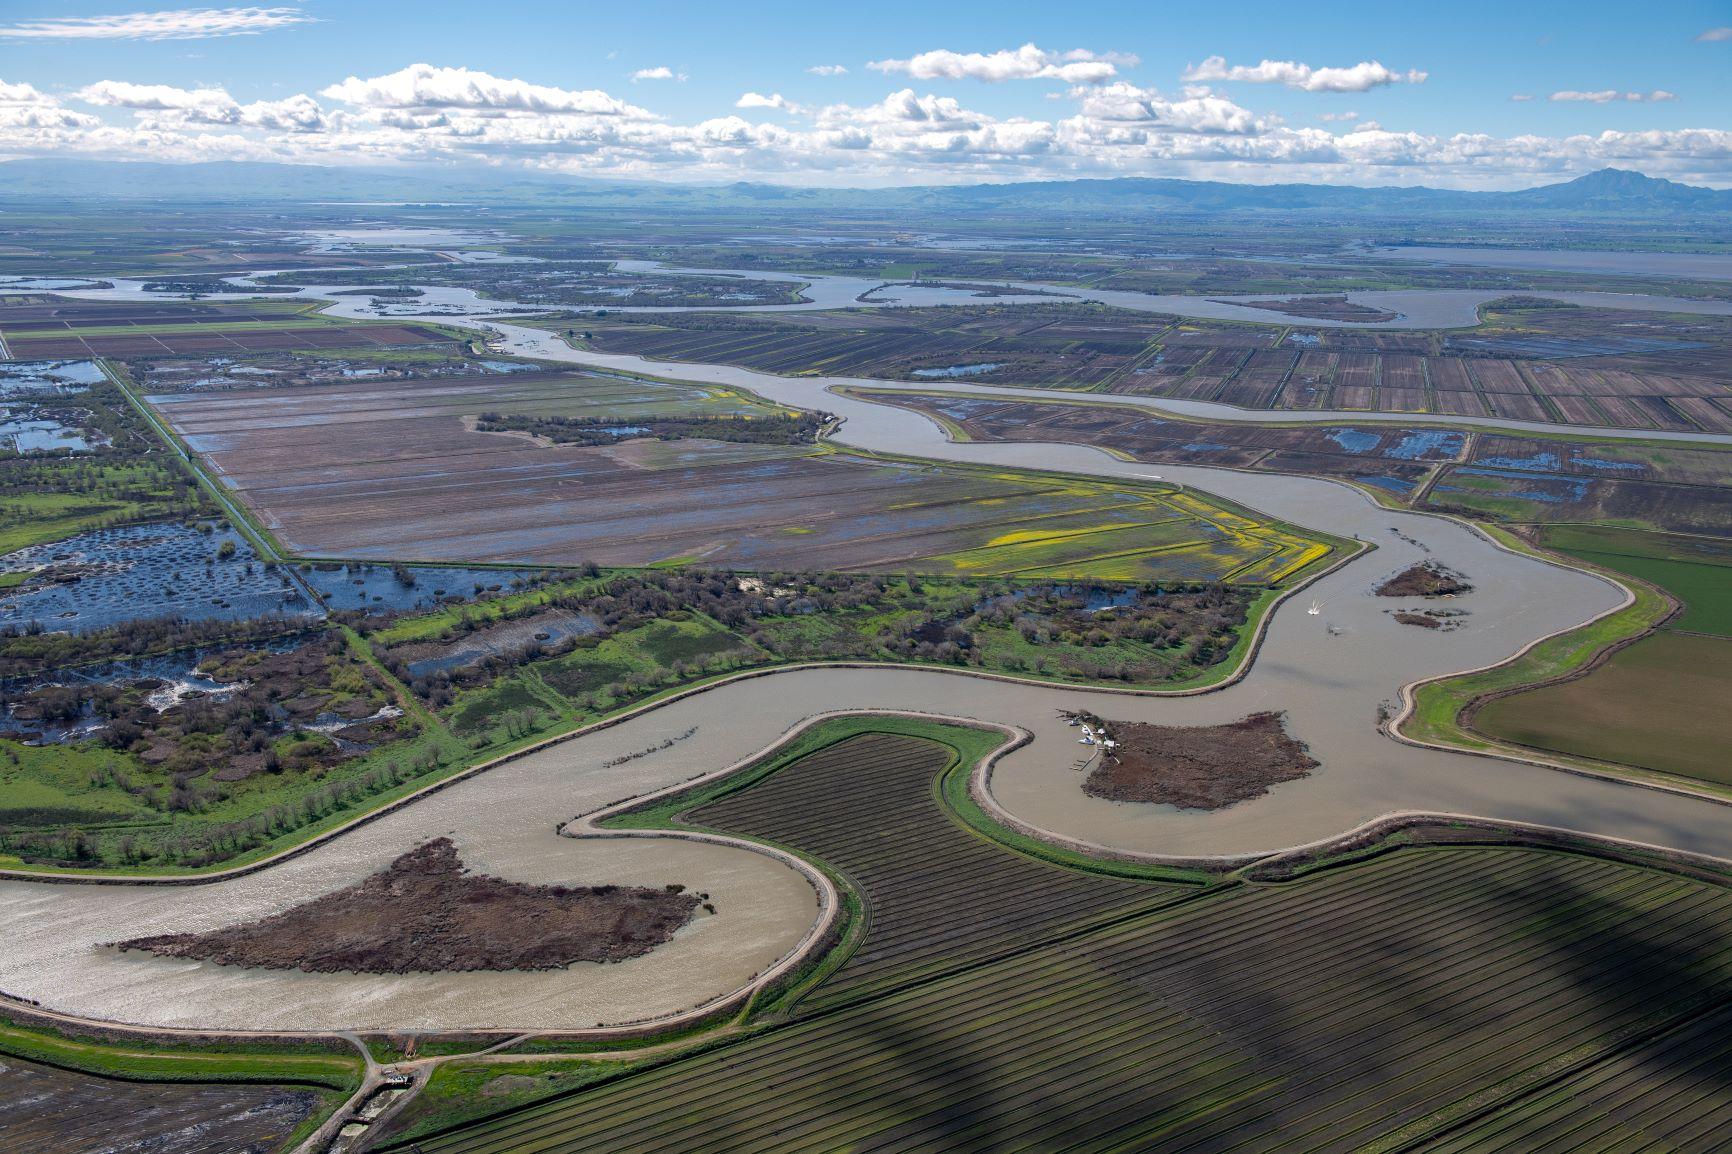 Aerial view of Sacramento-San Joaquin Delta waterways weaving through farmland